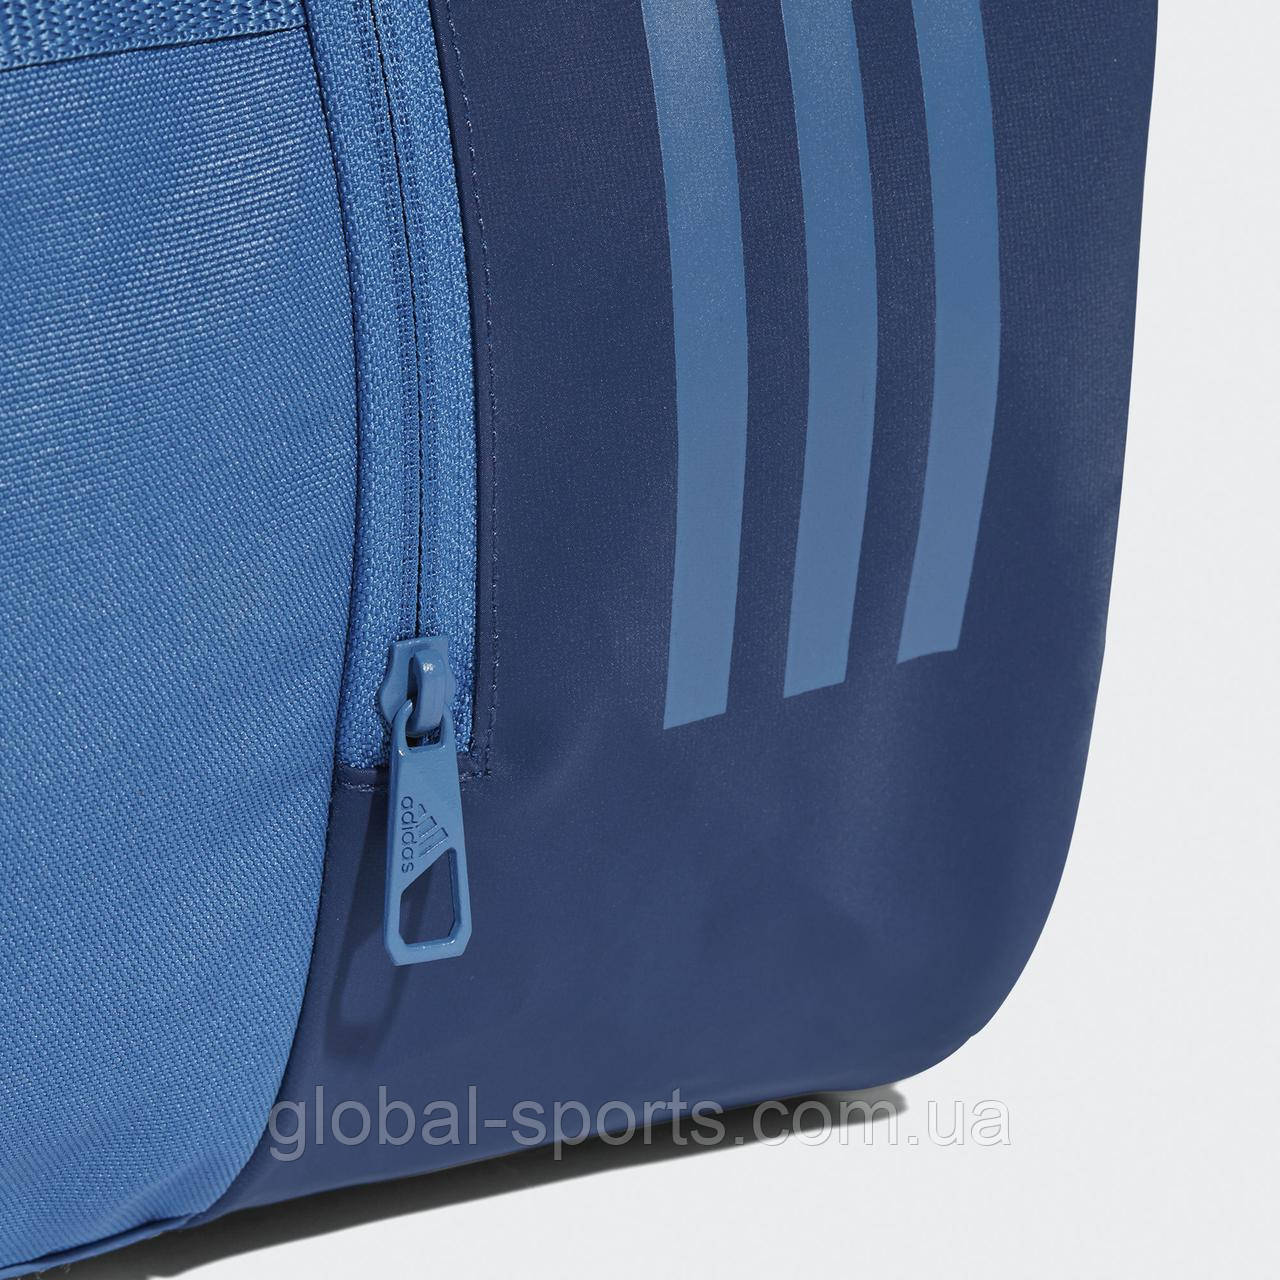 38f261012f8b Спортивная сумка Convertible 3-Stripes(Артикул:CV5077): продажа ...